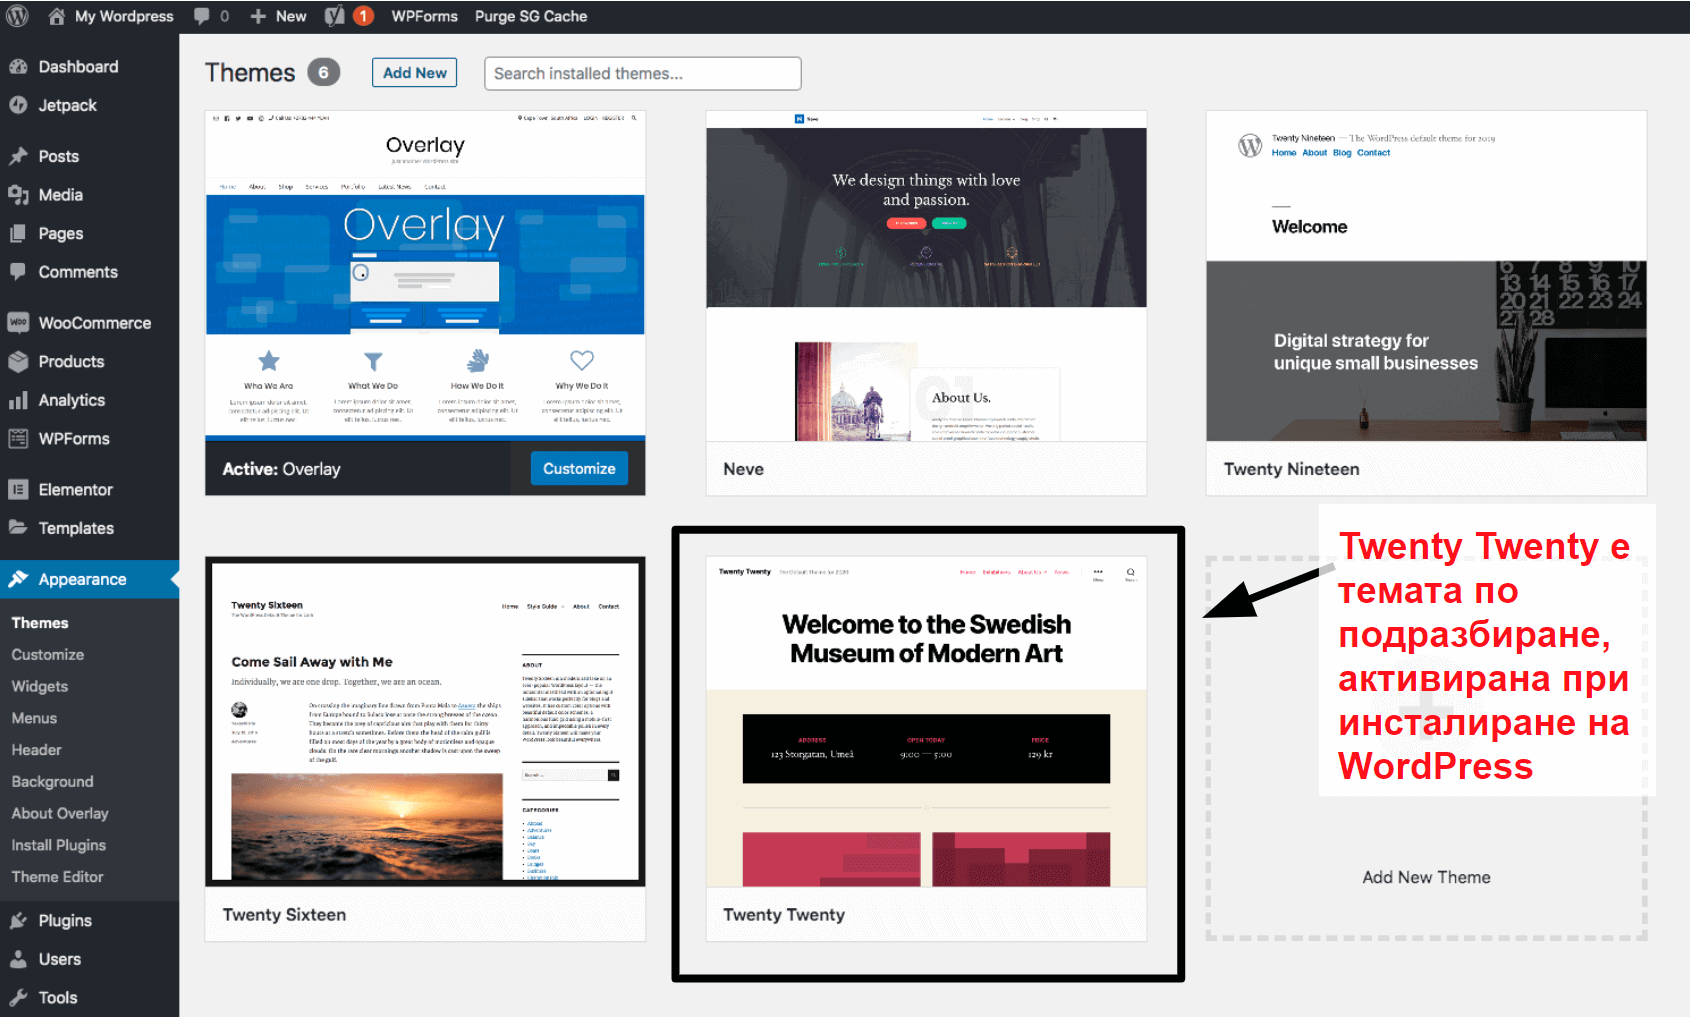 WordPress themes panel BG17